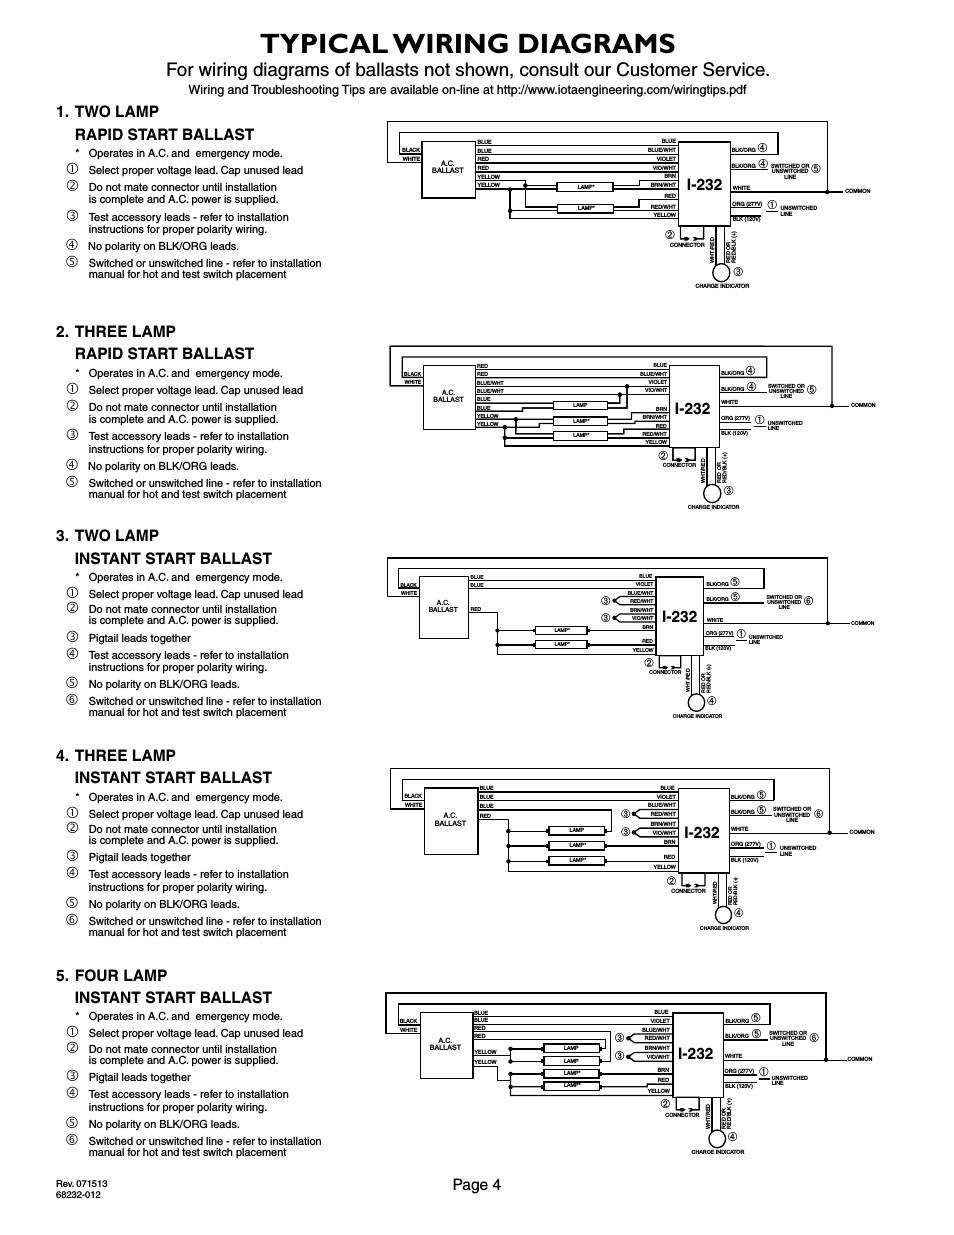 hight resolution of iota i320 emergency ballast wiring diagram download emergency ballast wiring 2 g download